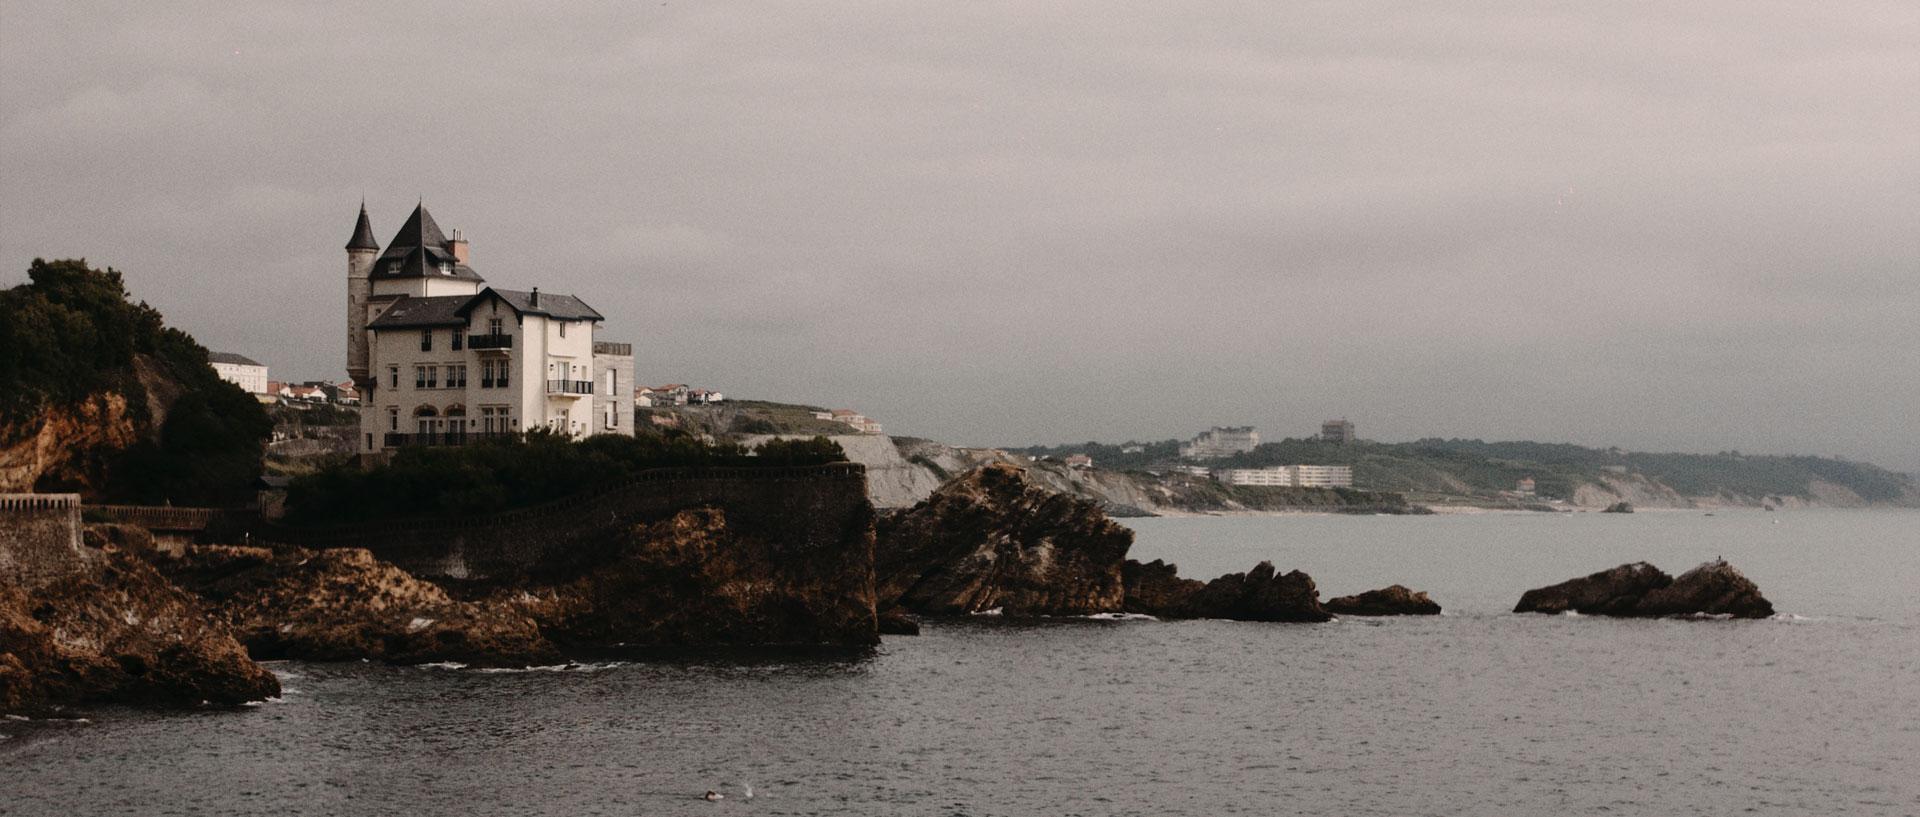 Natasha & Jad Wedding - Casino Biarritz (4).jpg